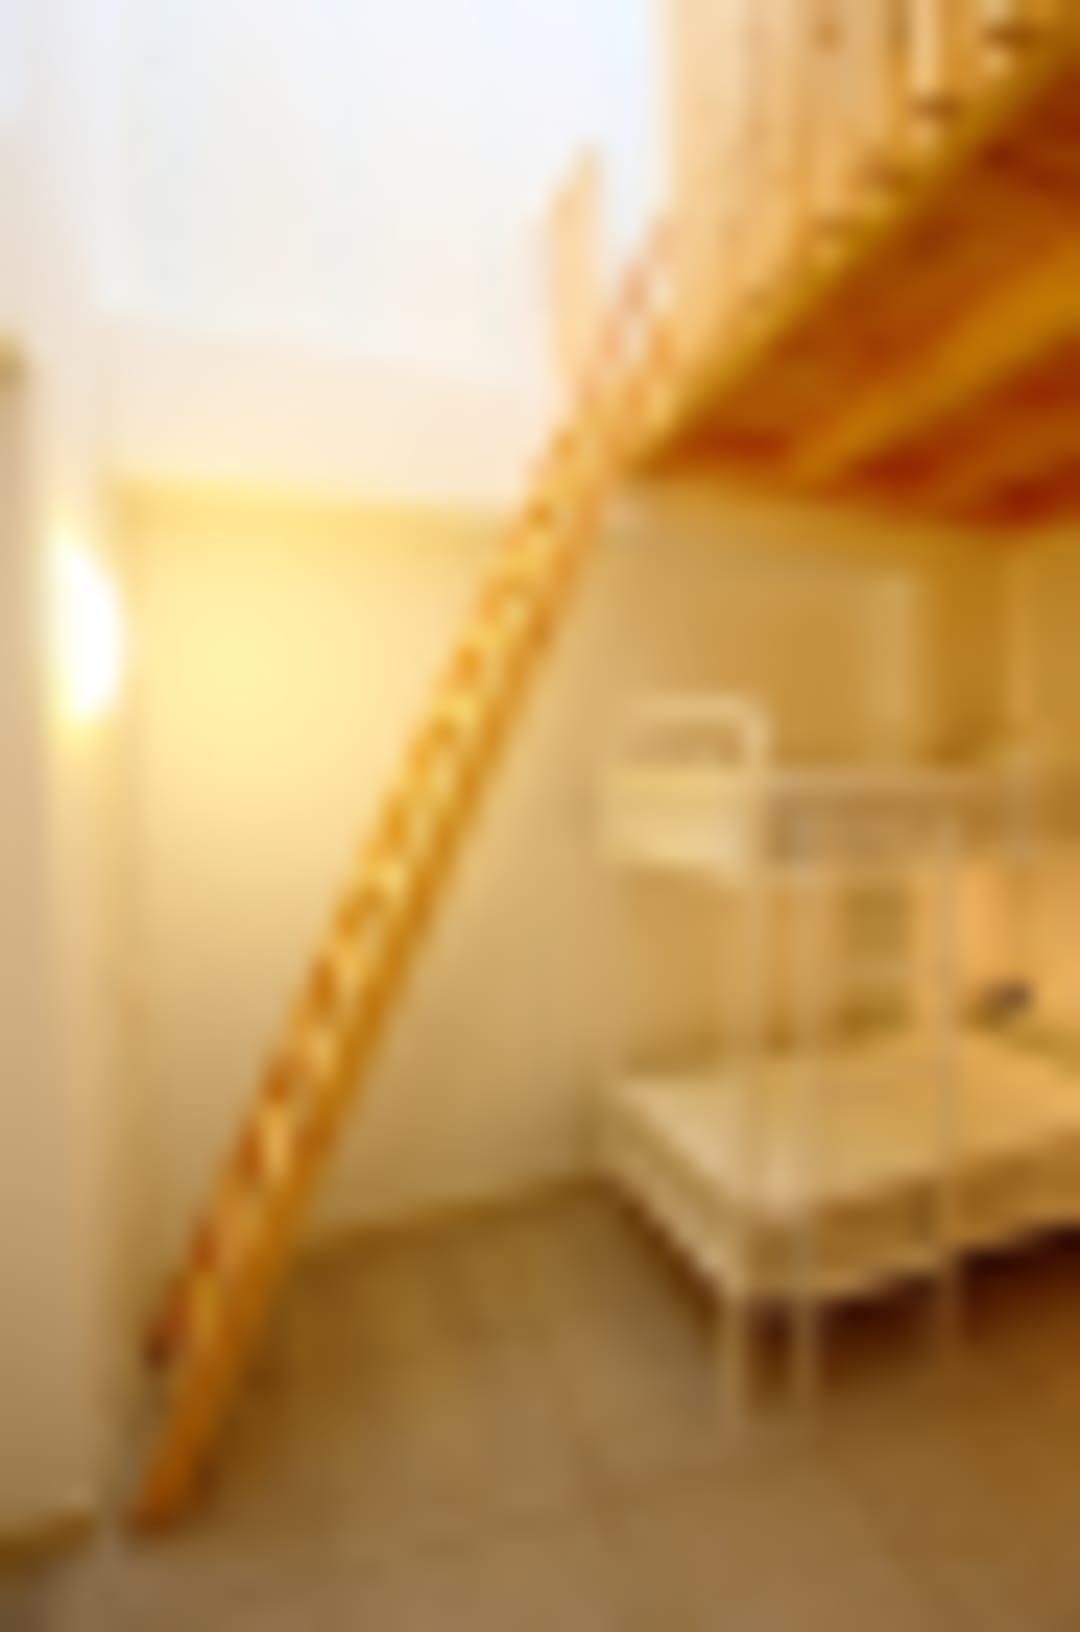 Albergue Loop INN Hostel Cartagena - Cartagena (Murcia)